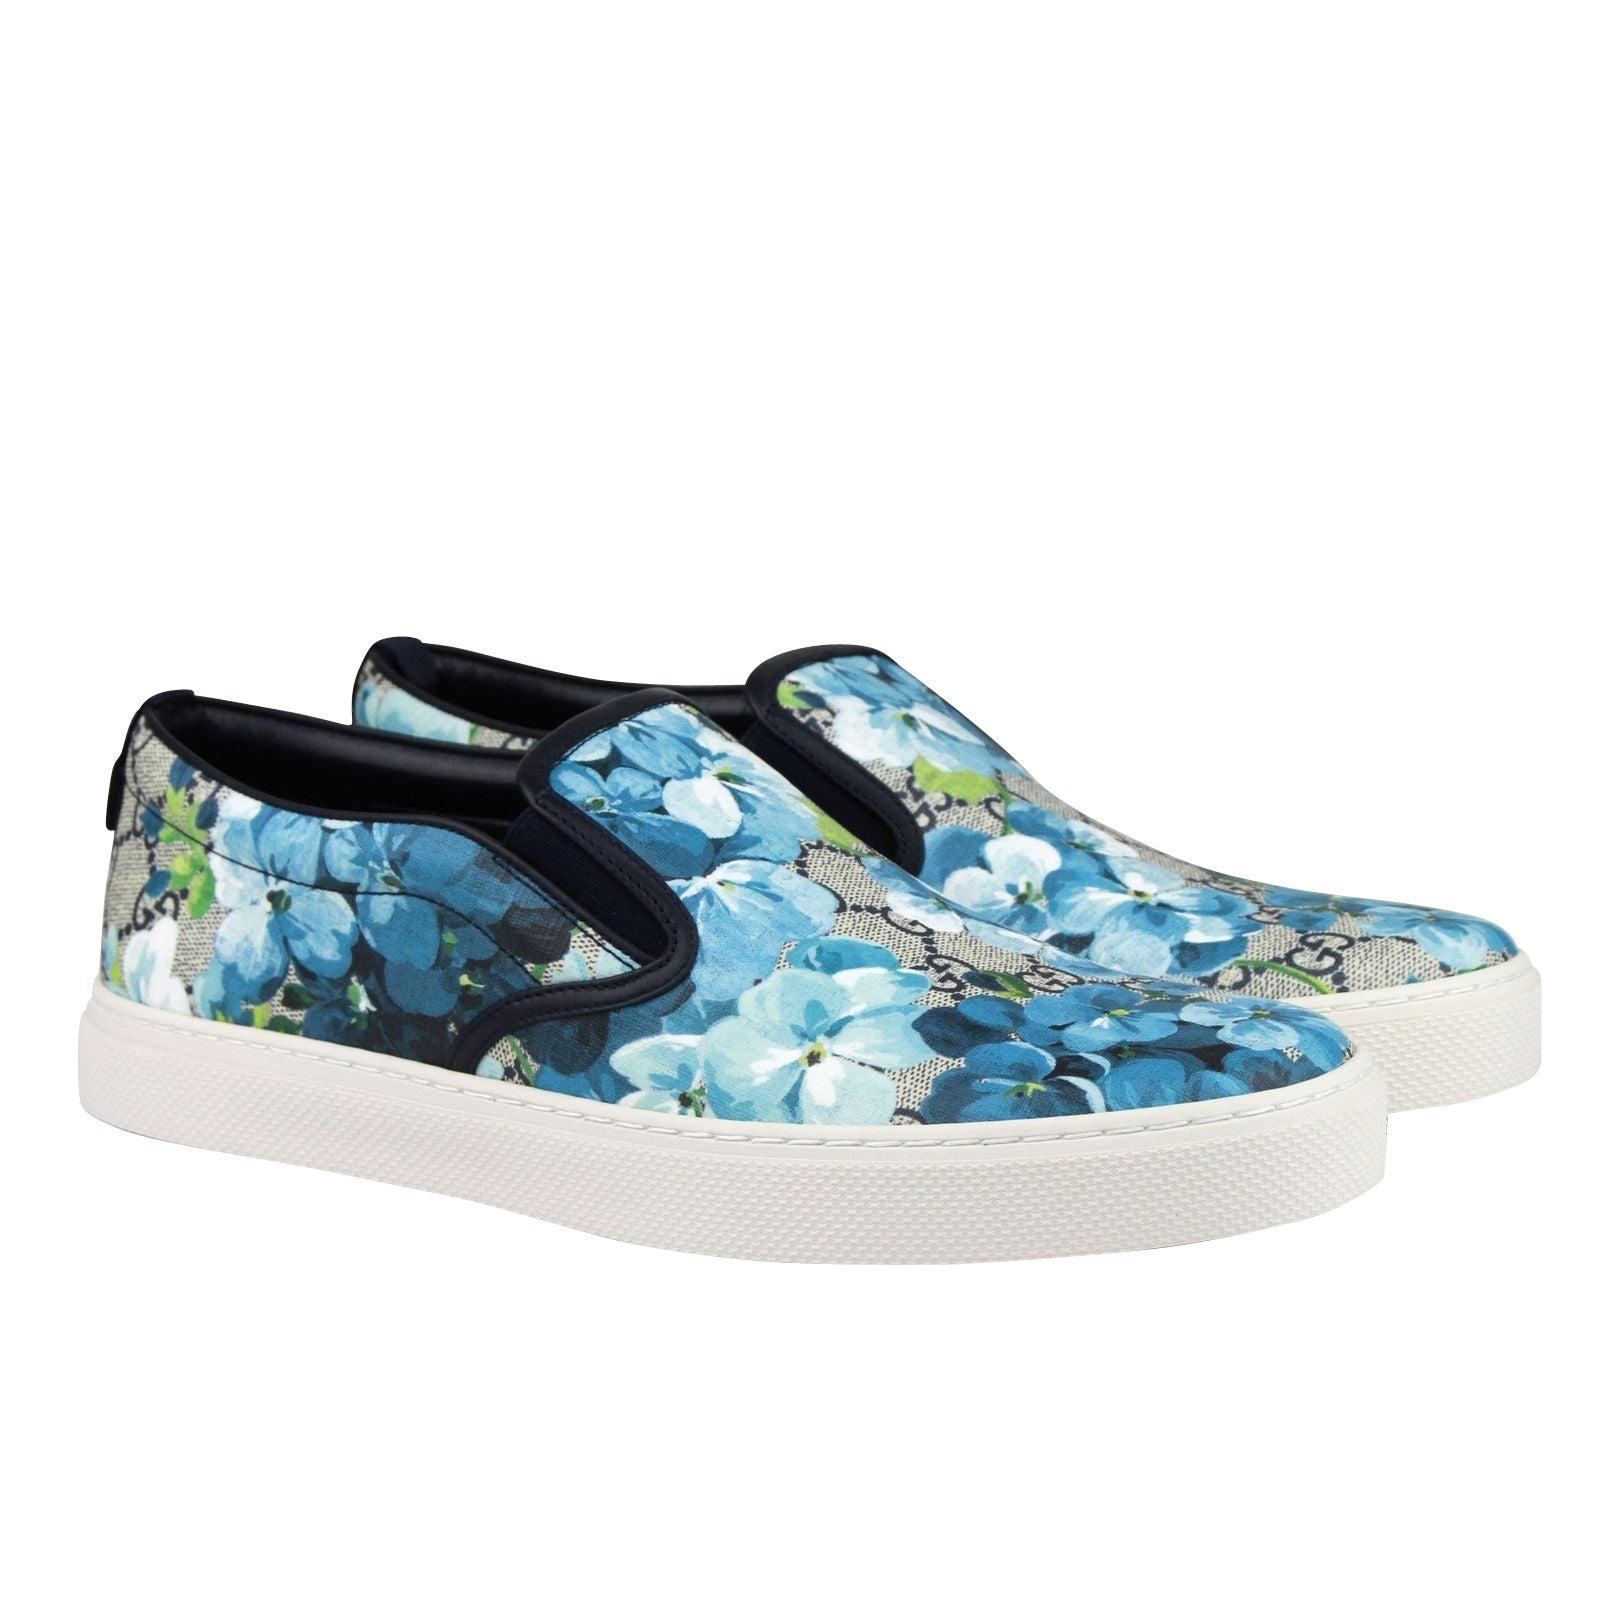 gucci men's slip on shoes